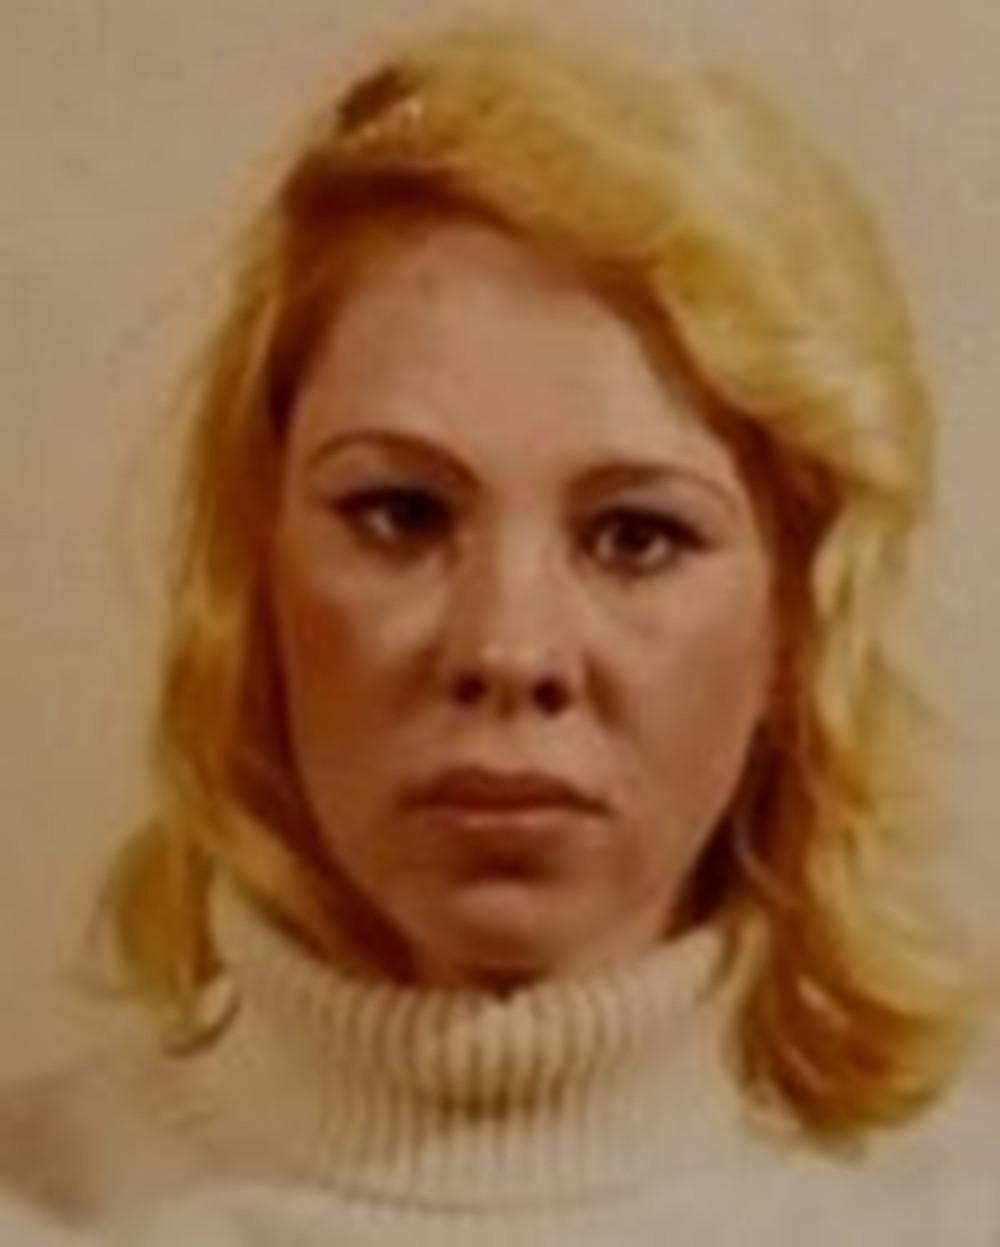 Lisa Nichols, 28, was found on September 16, 1984, along Interstate 40 near West Memphis, Arkansas.